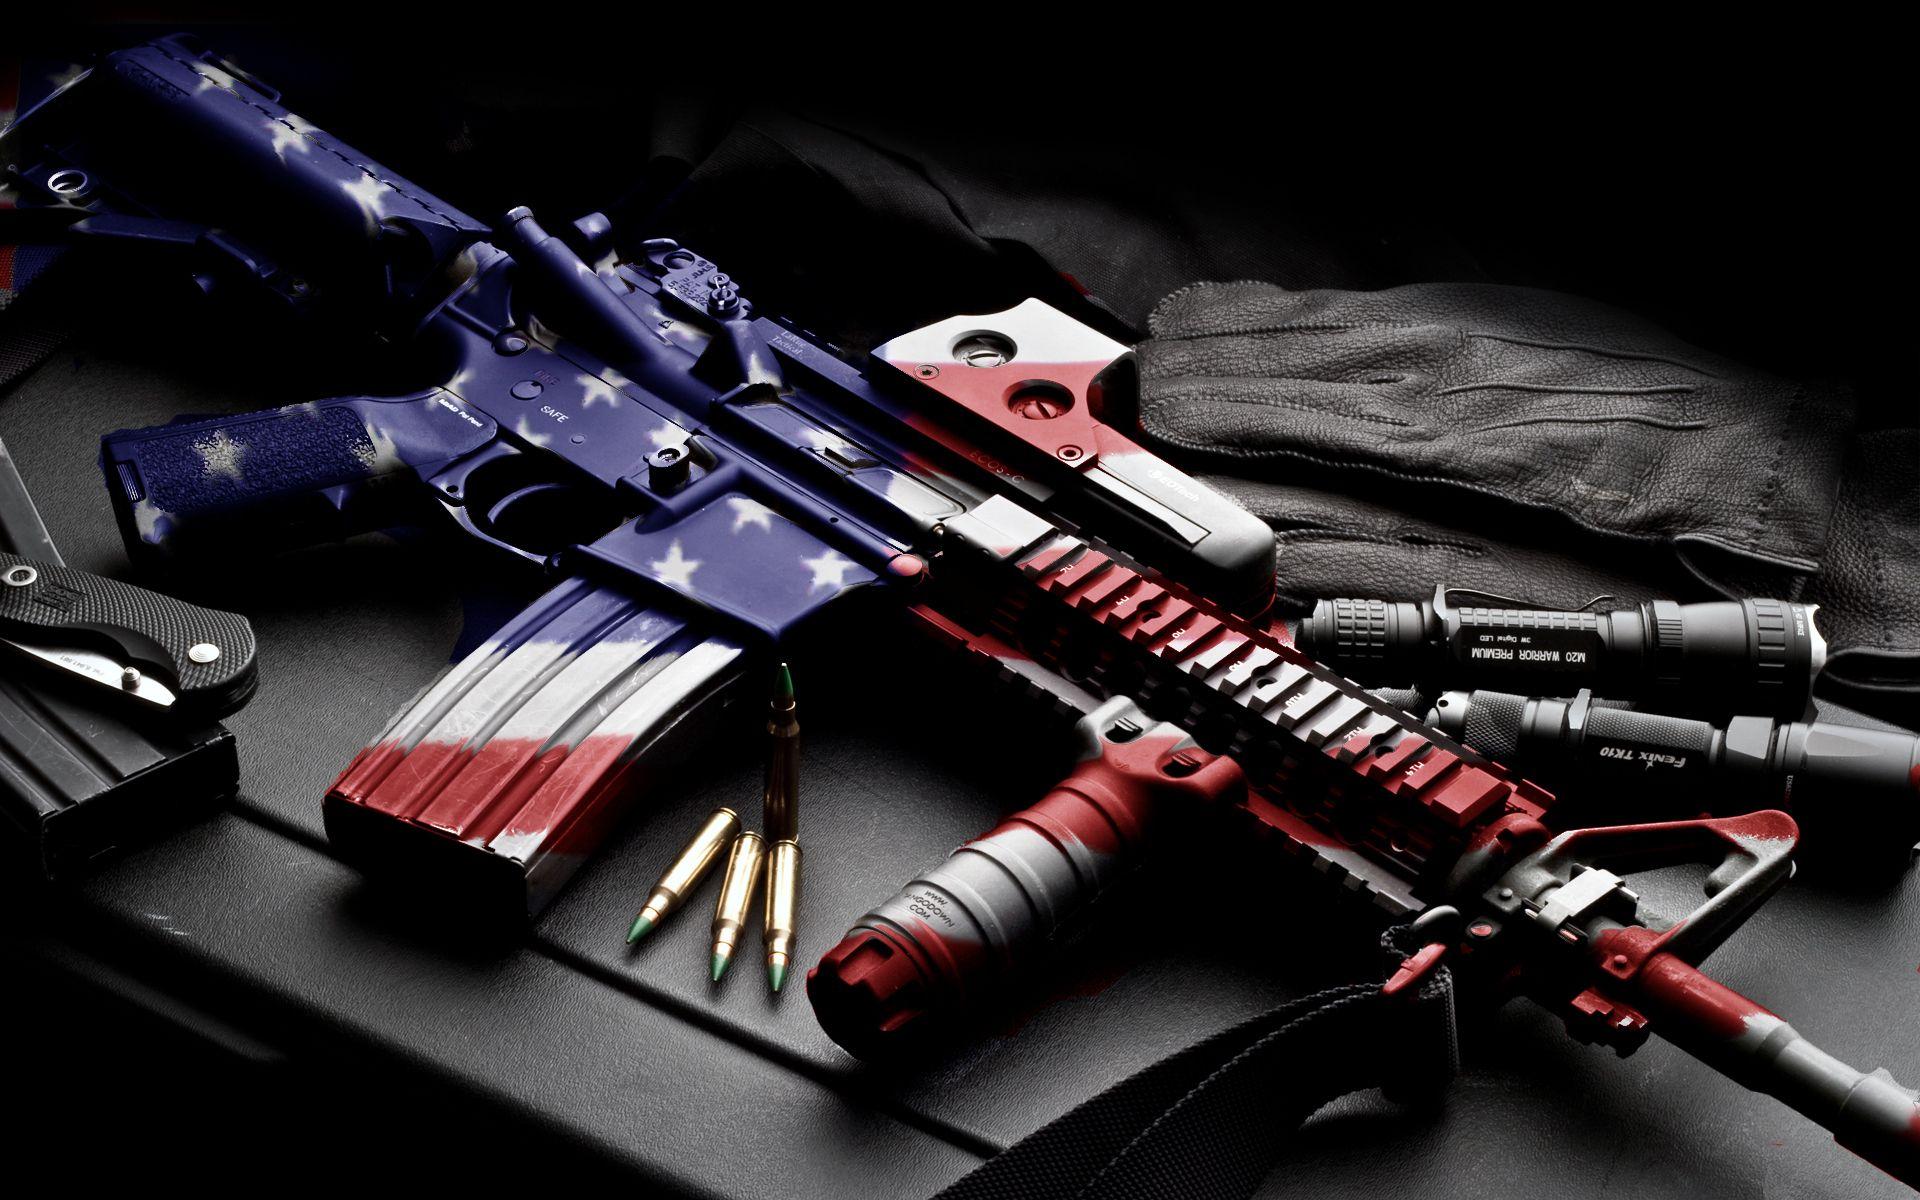 Artesanato Pernambuco ~ Armas Fuzil De Assalto M16 Rifle Papel de Parede ArMaS Pinterest Armas de fogo, Papéis de